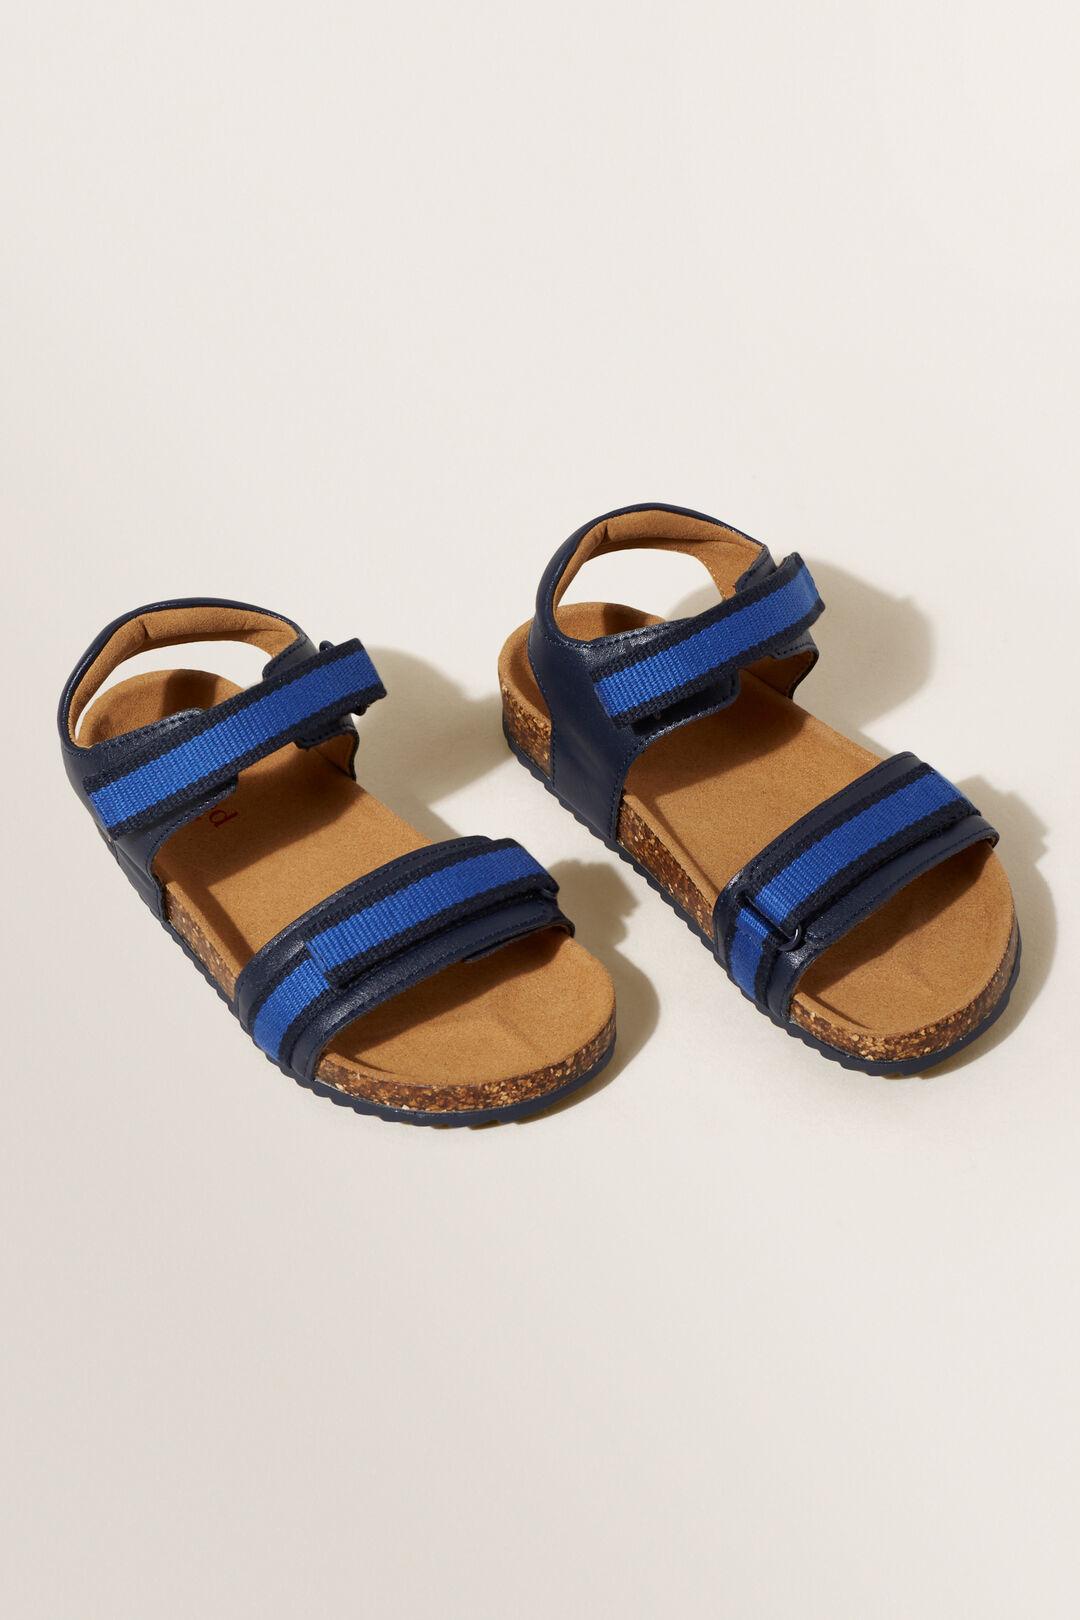 Double Tape Strap Sandal  NAVY  hi-res